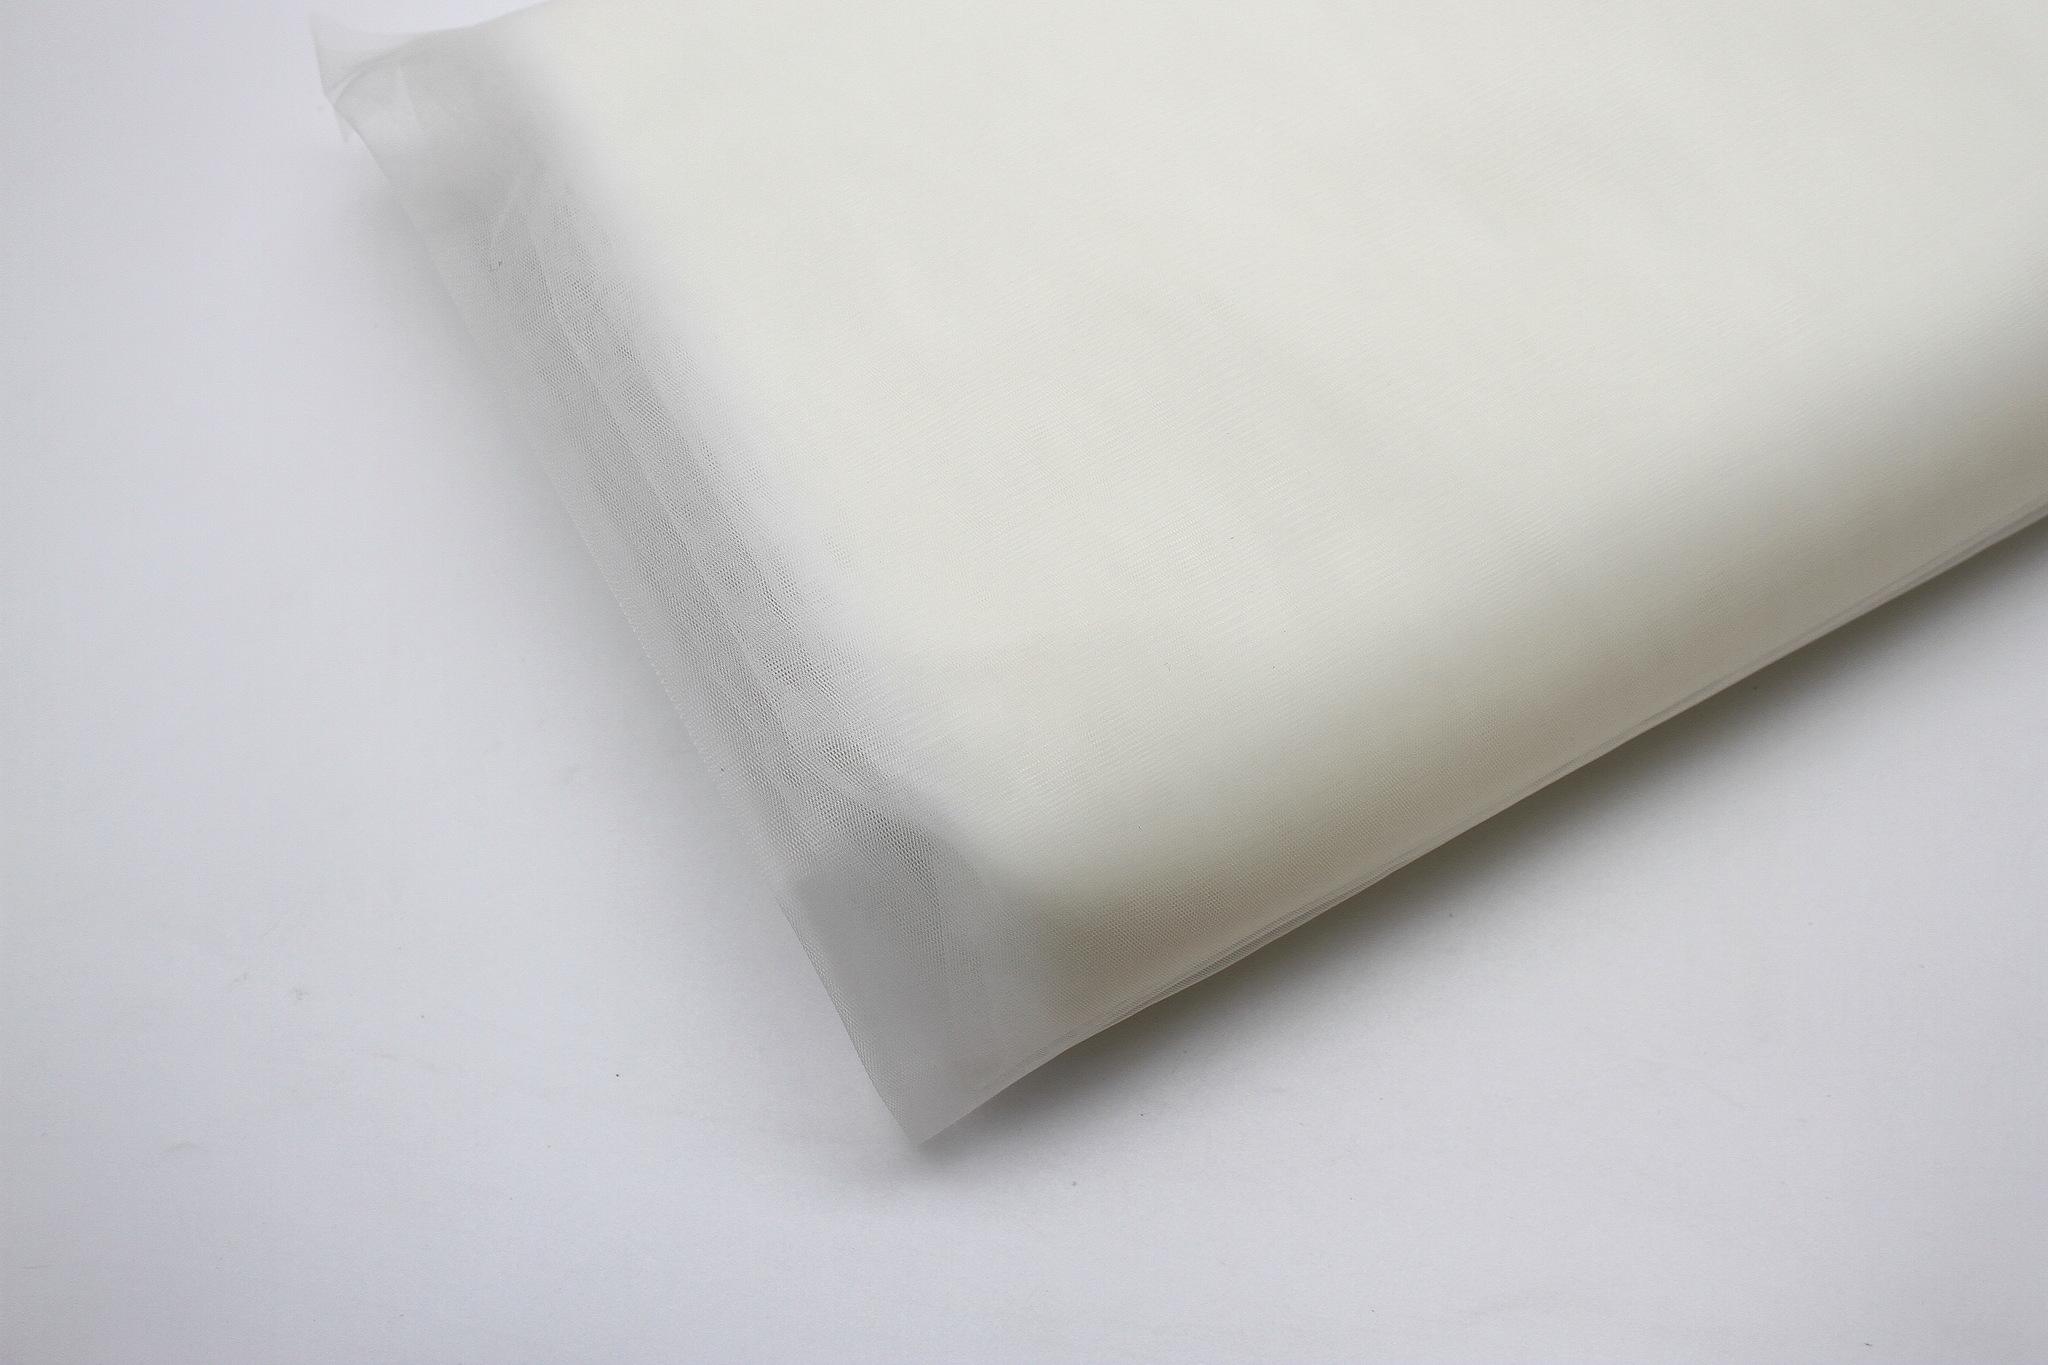 Еврофатин белый теплый